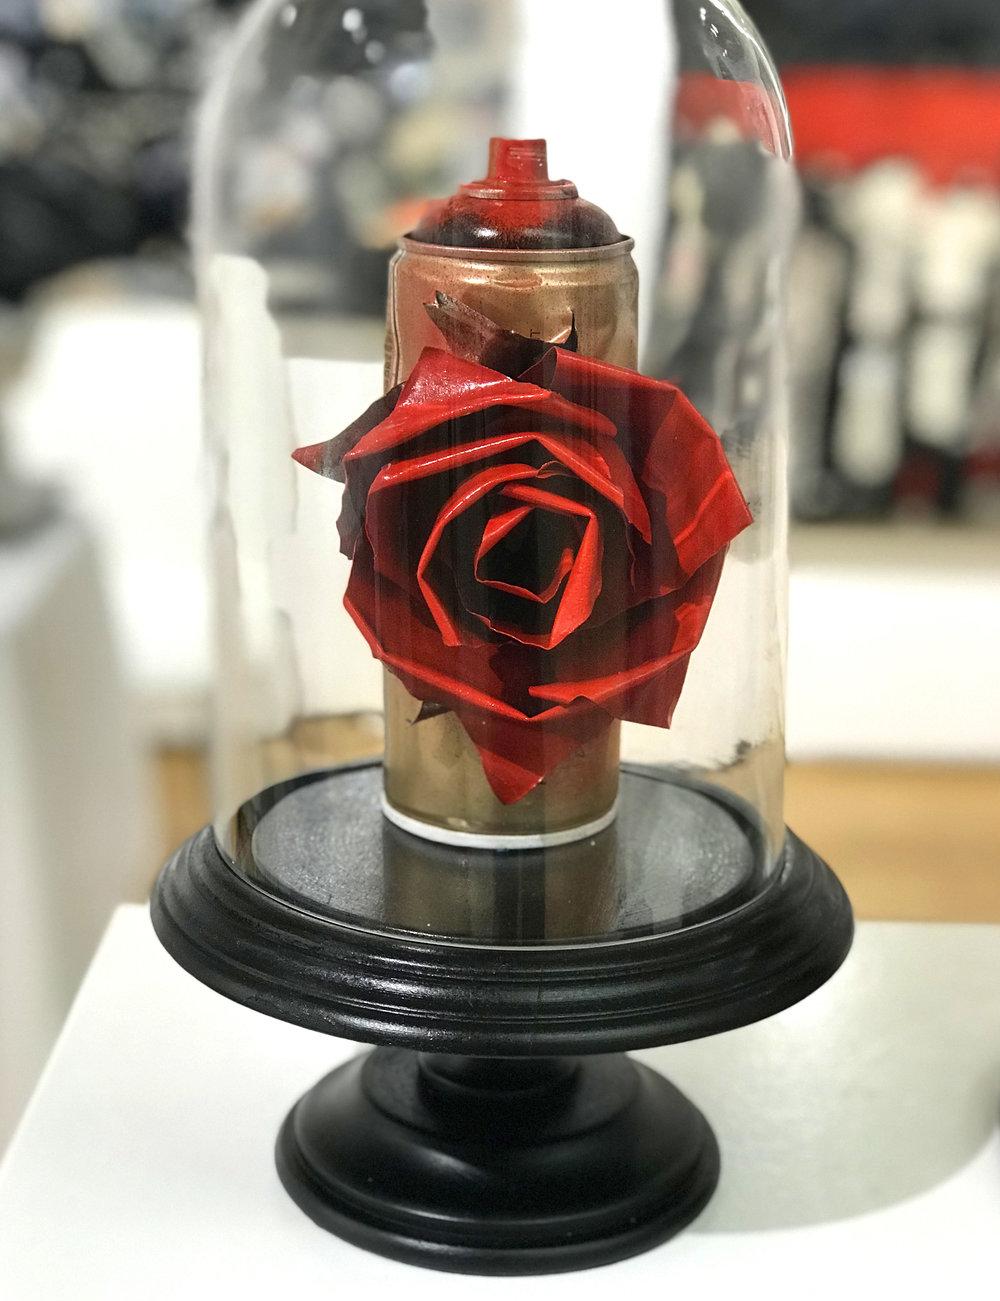 rose-sm-red.jpg